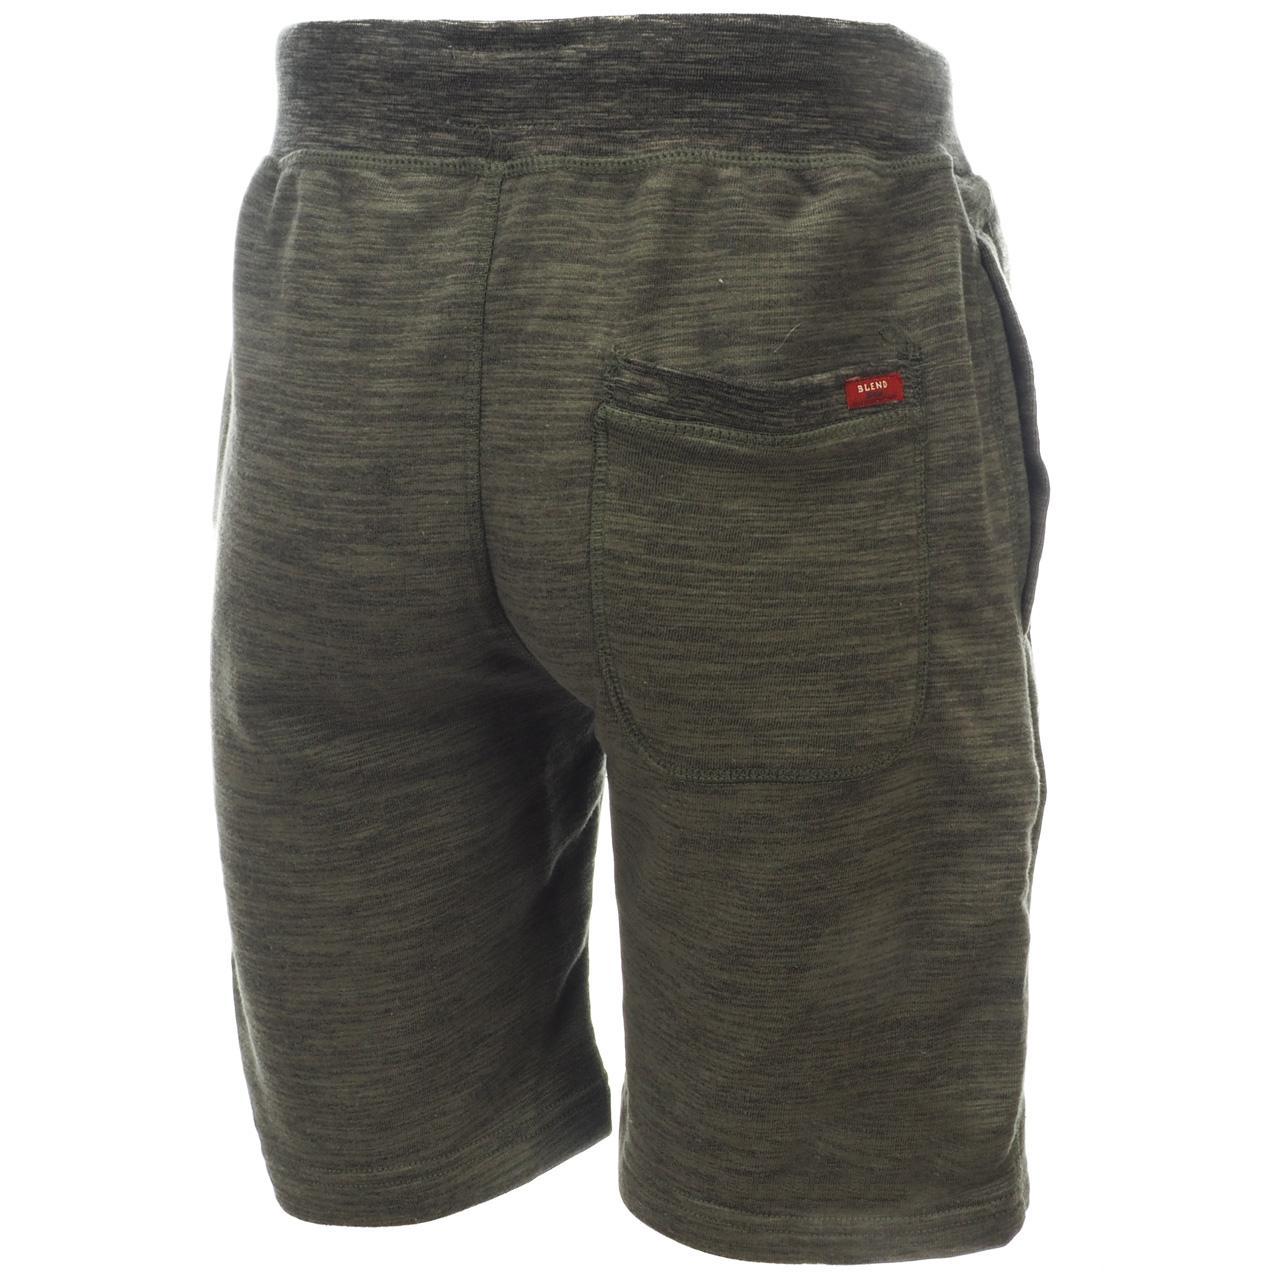 Bermuda-Shorts-Blend-Fadel-Khaki-Sw-Shorts-Green-18064-New thumbnail 4